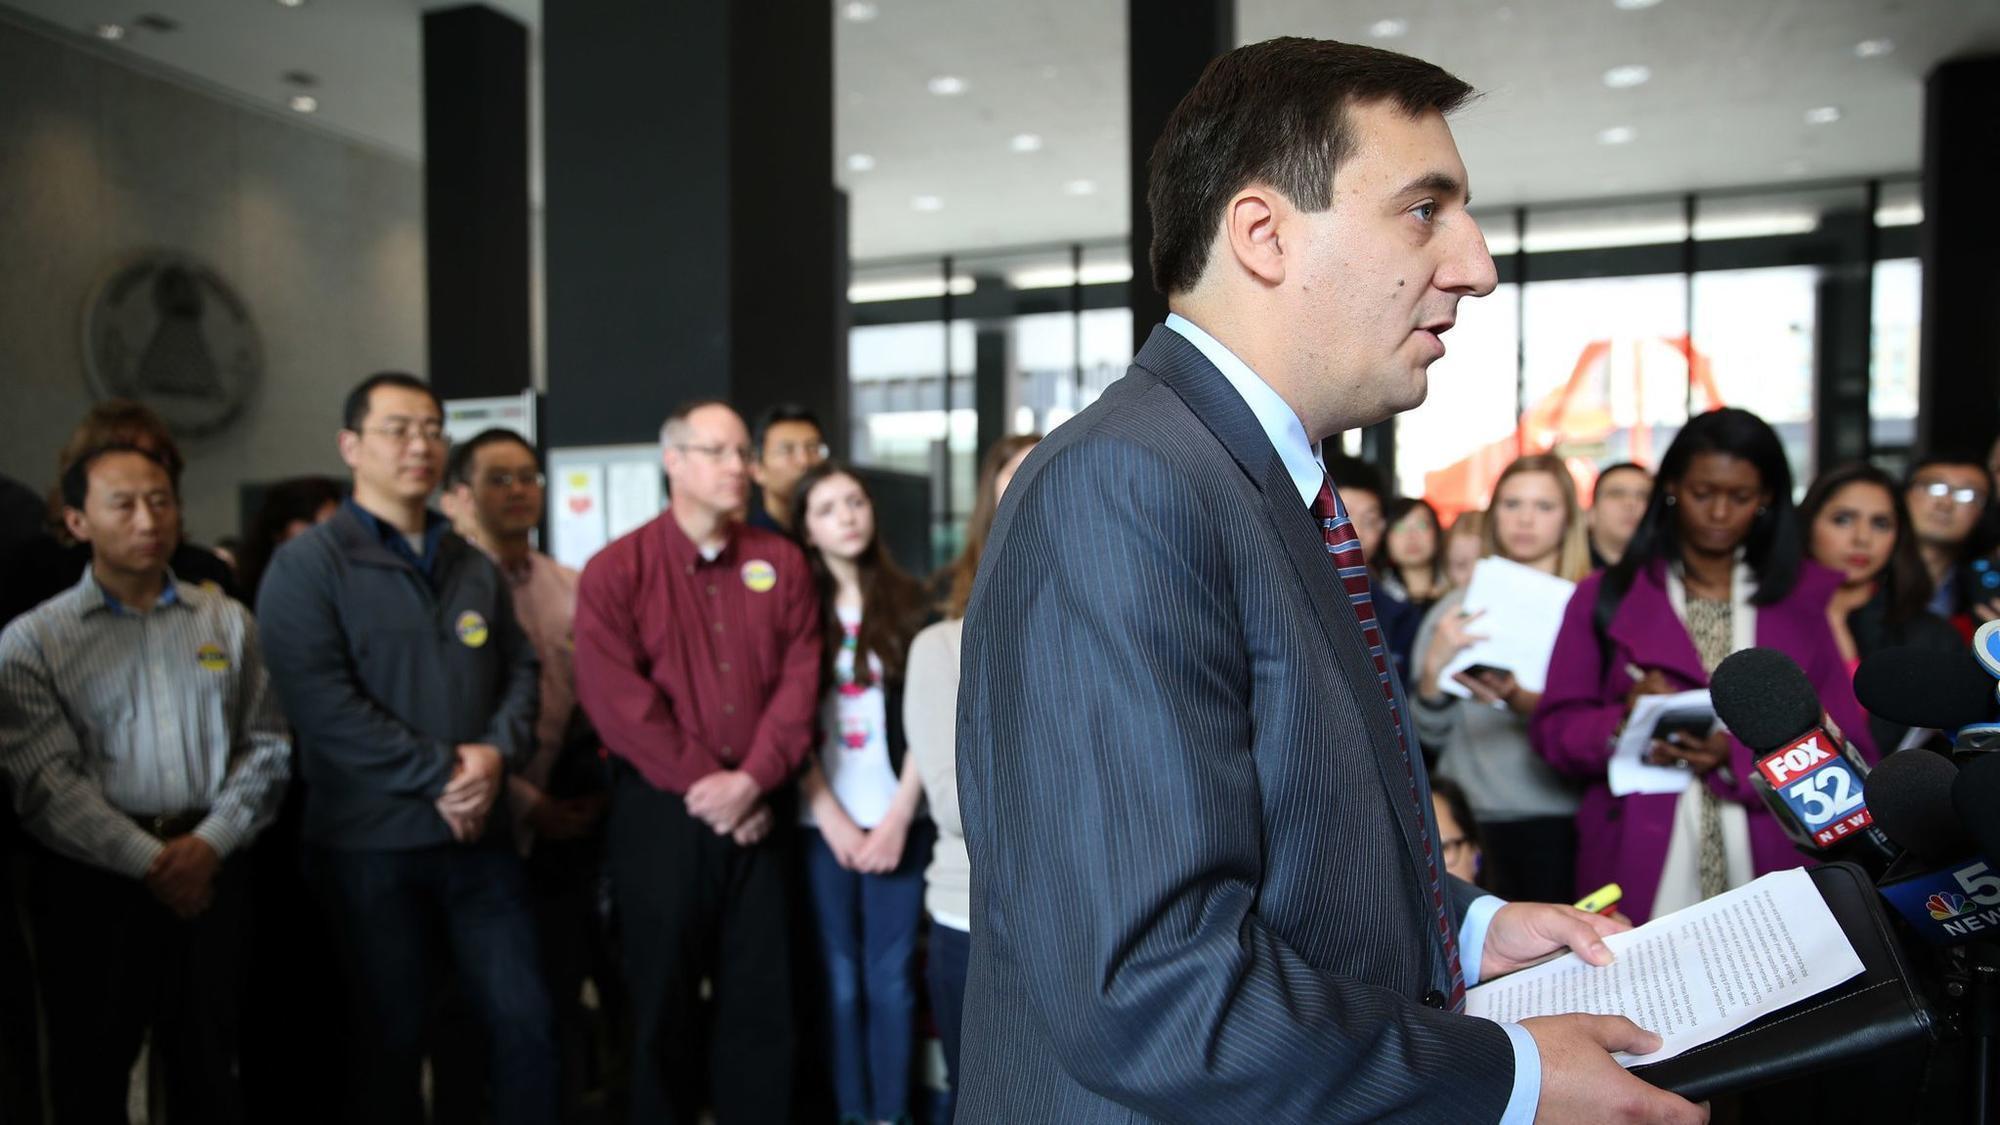 Ed Department Sued Over Handling Of >> Parents Abruptly Drop Lawsuit Over Transgender Student Locker Room